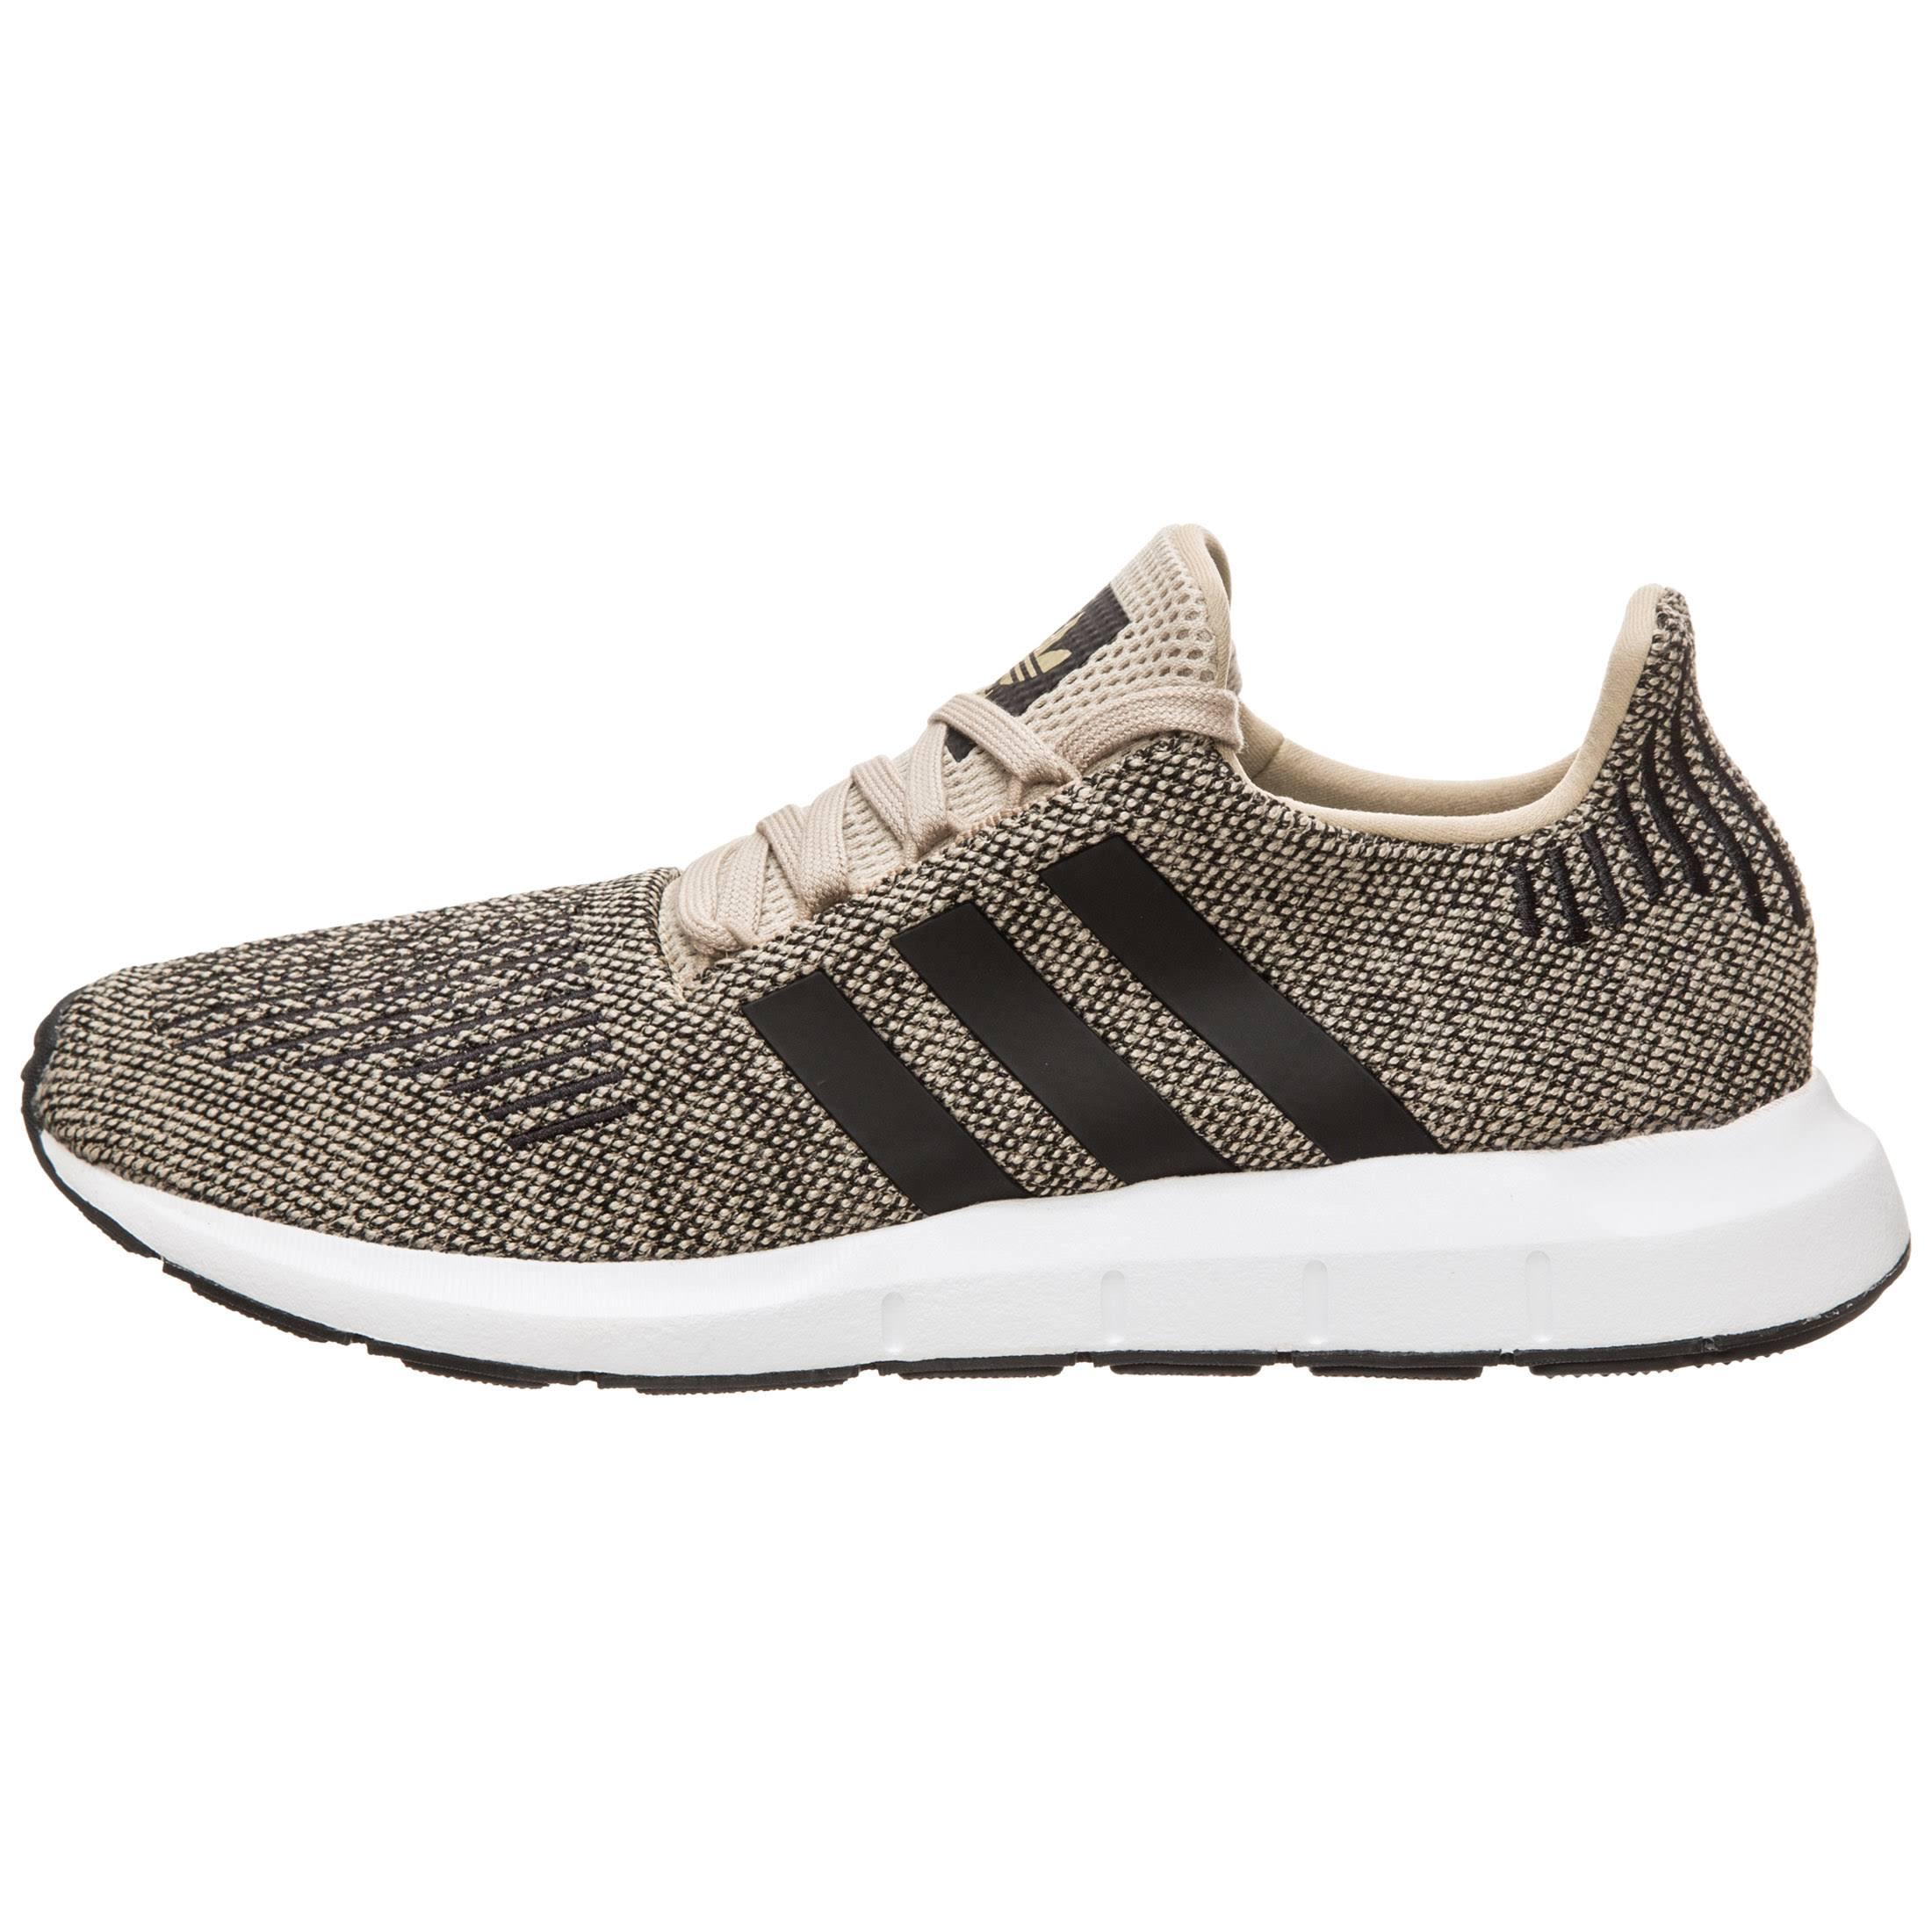 Sneaker Adidas Run Swift Swift Adidas Braun dIqf4Yw